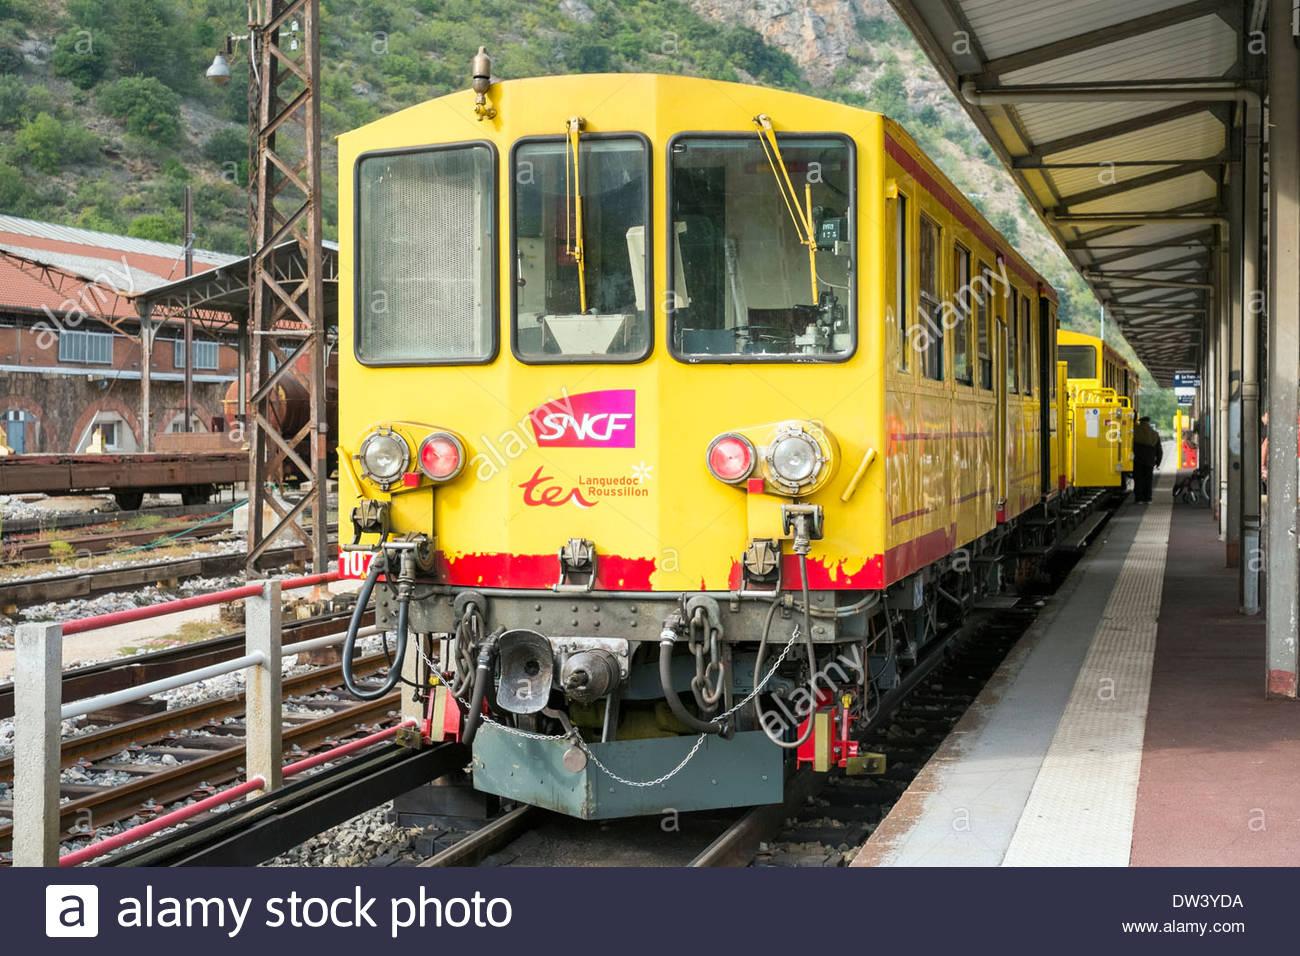 Train Jaune (Yellow Train) at the station in Villefranche-de-Conflent, Pyrénées-Orientales, Languedoc-Roussillon, France - Stock Image